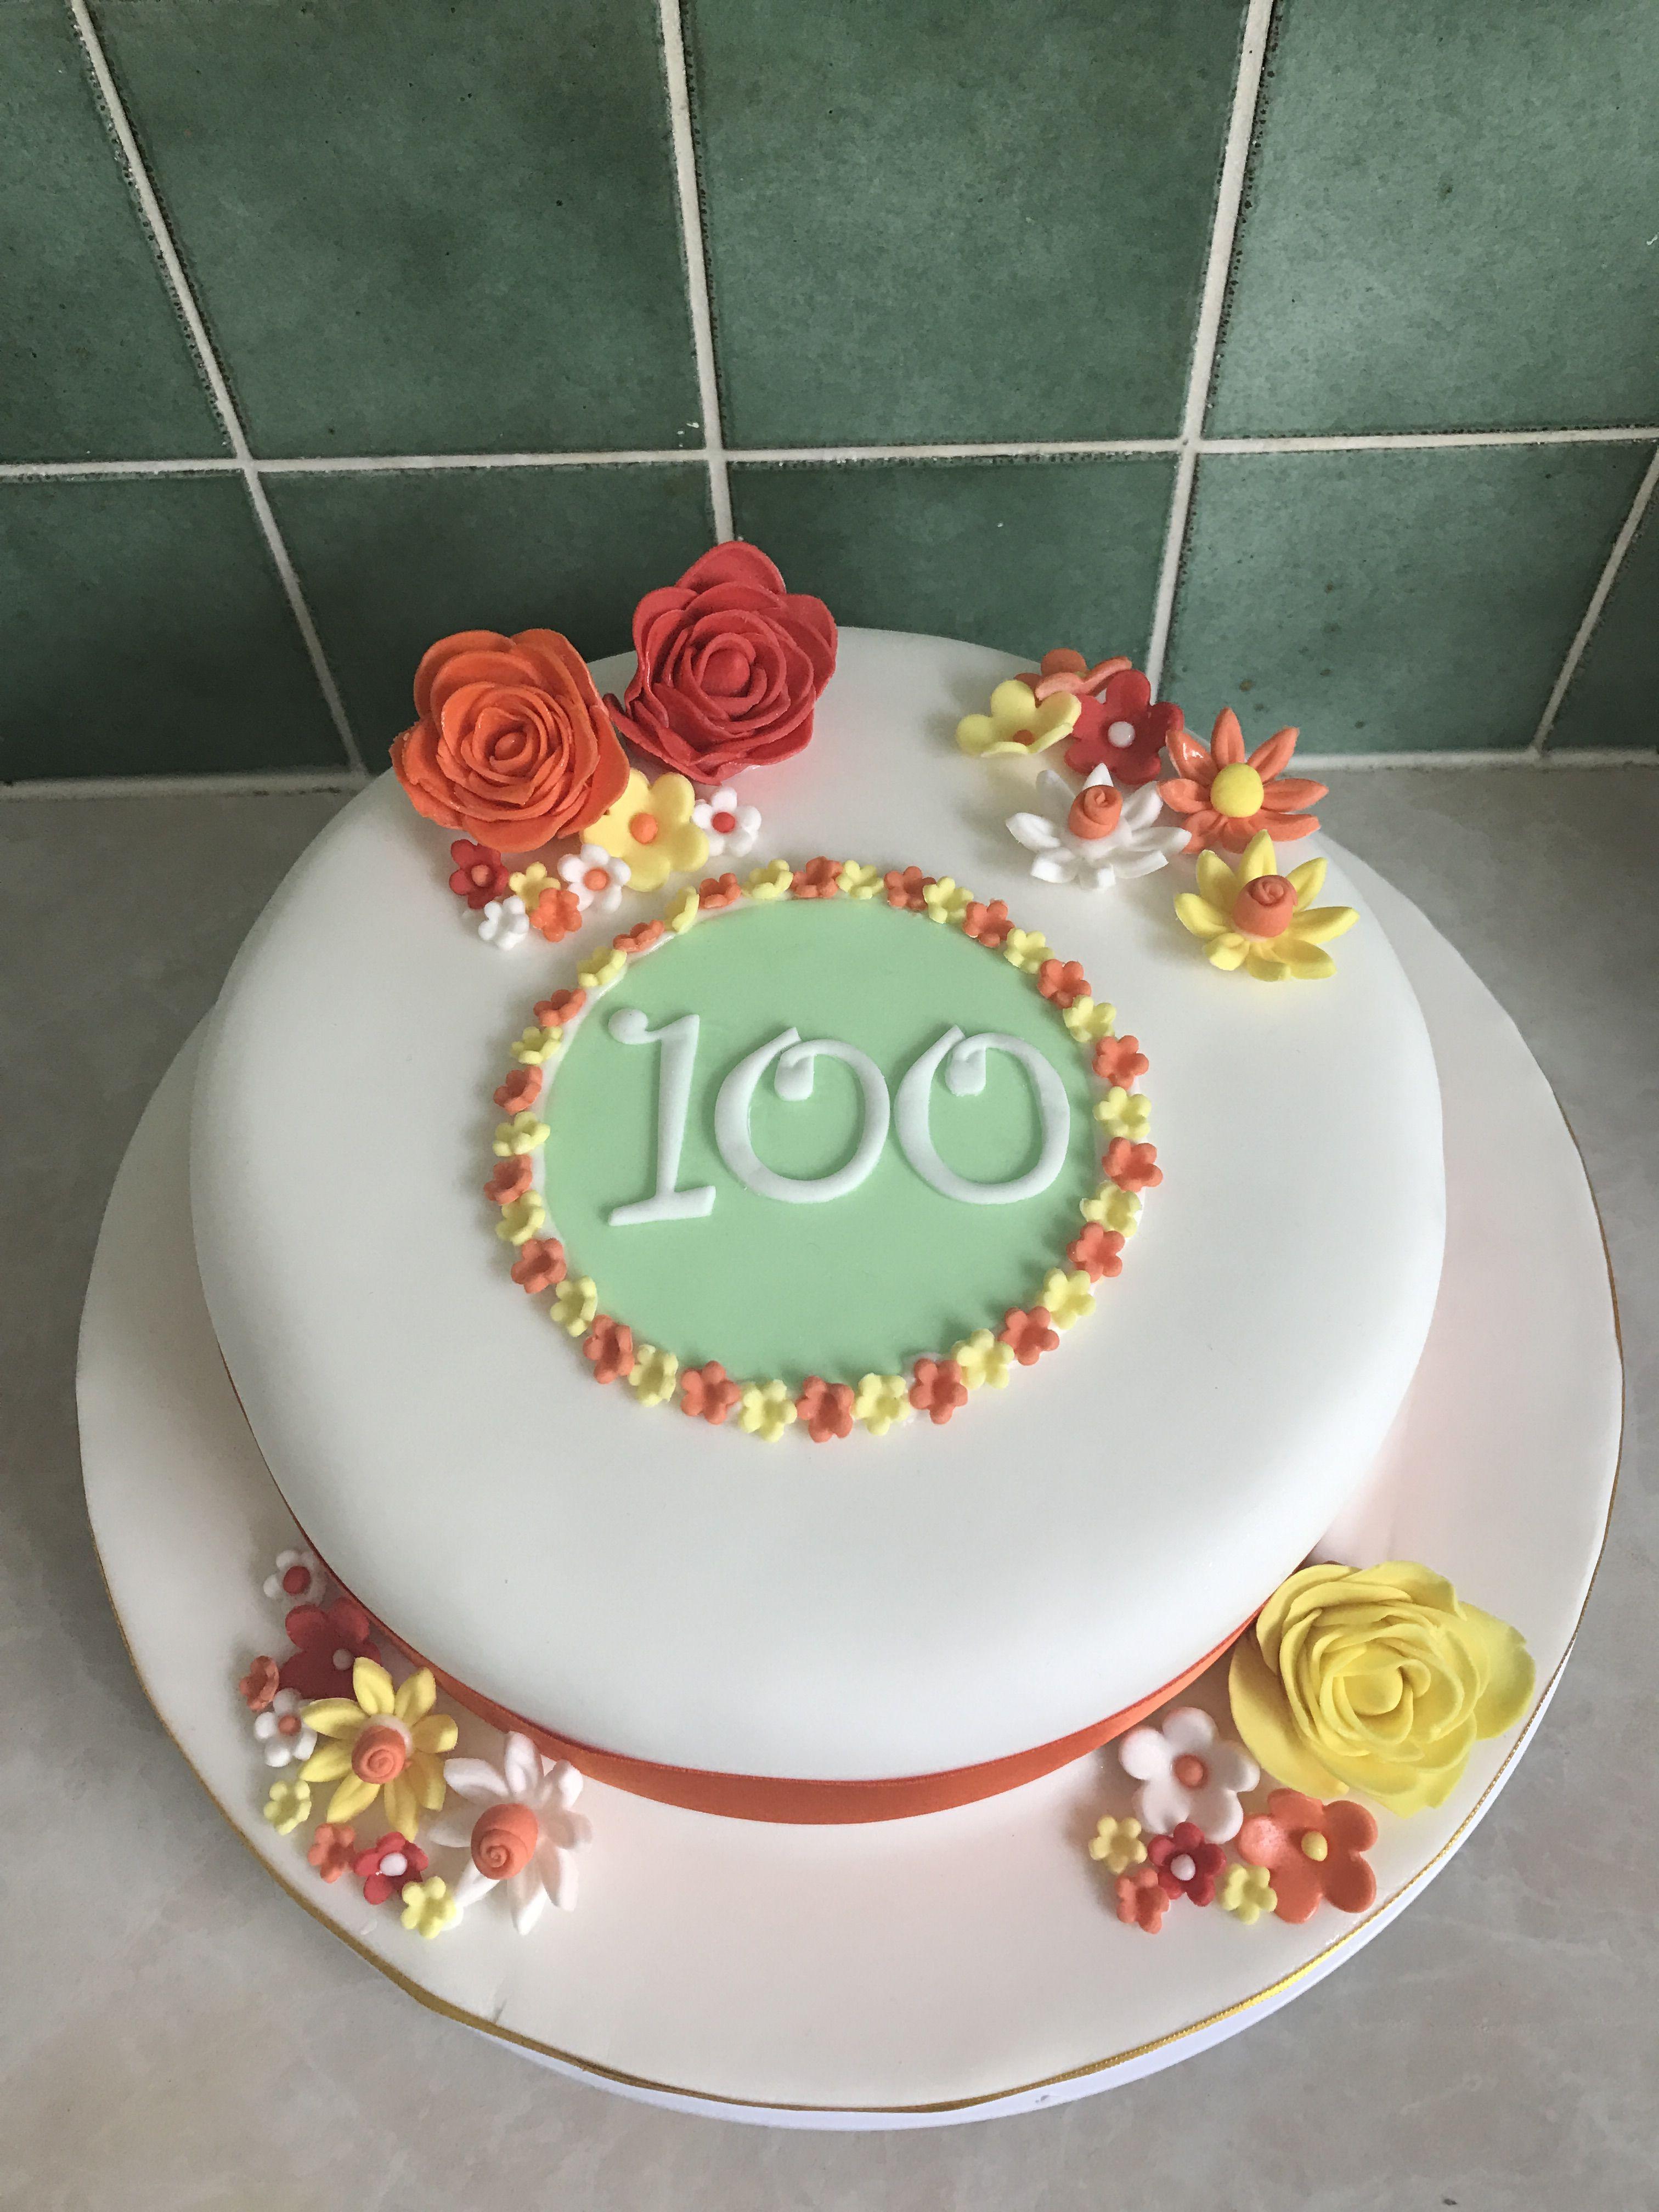 Simple Flower Birthday Cake For 100th Birthday My Cake Creations